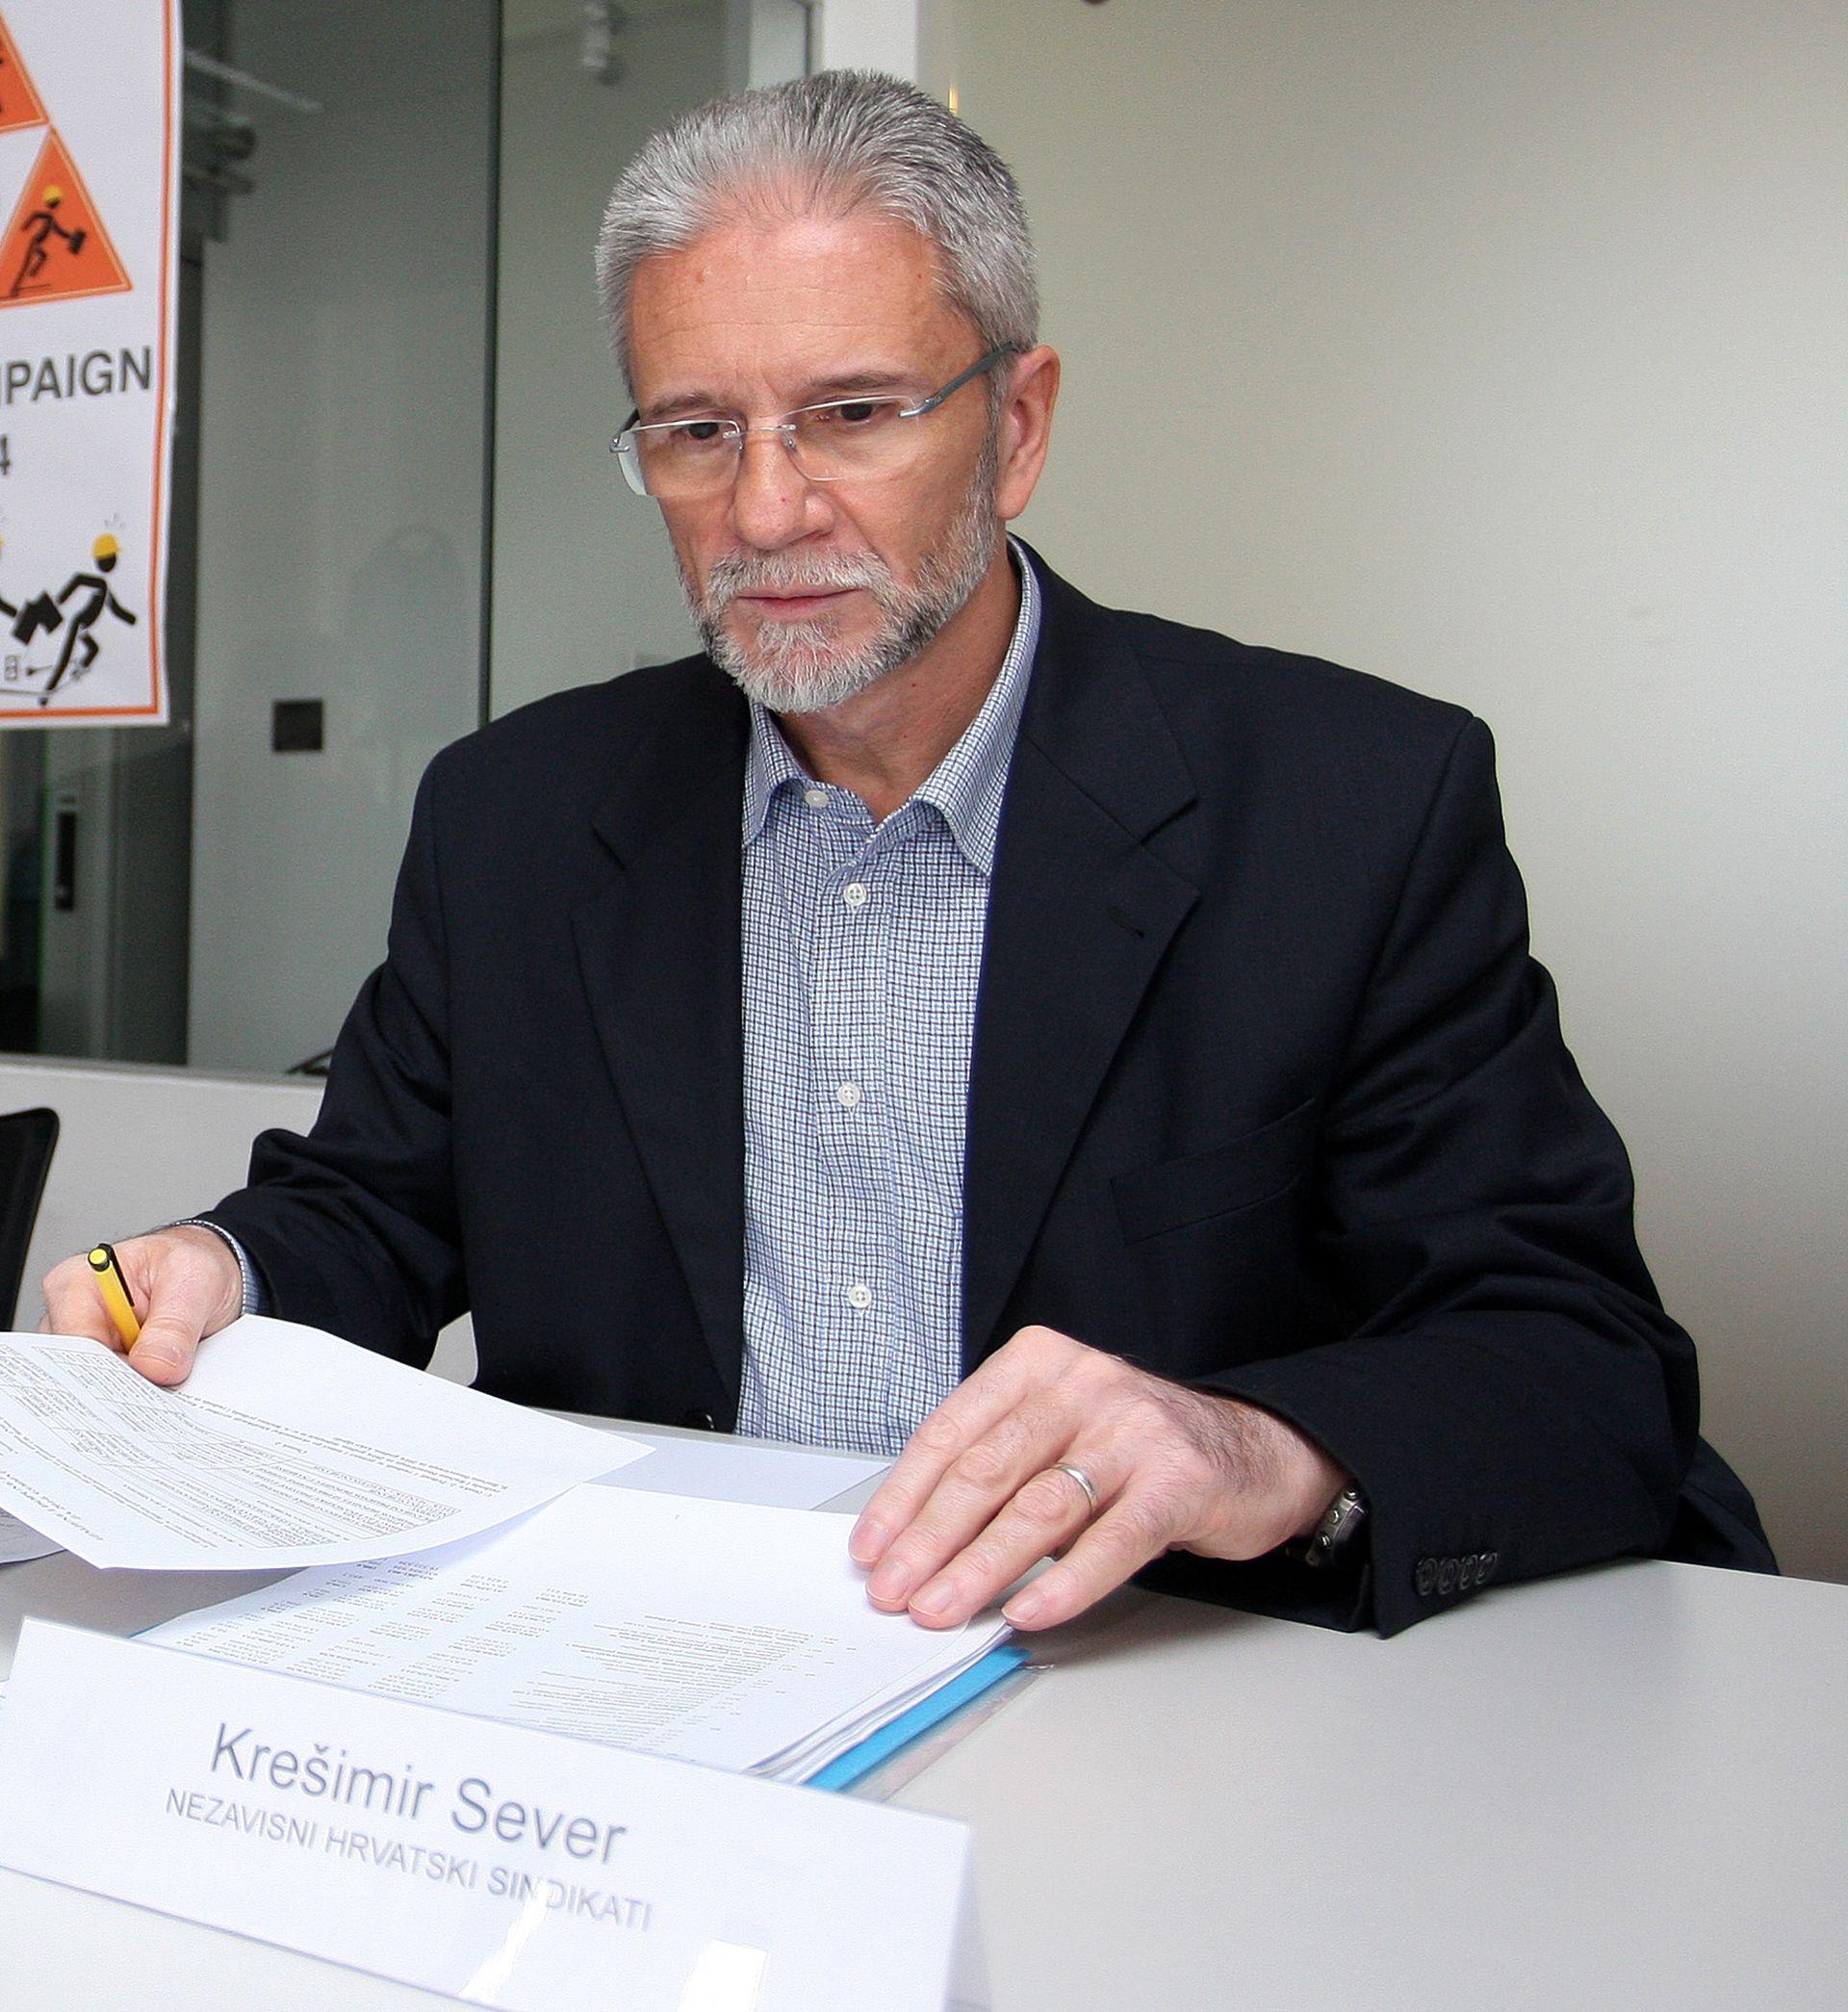 KREŠIMIR SEVER: 'Poskupljenje plina je udar na građane'